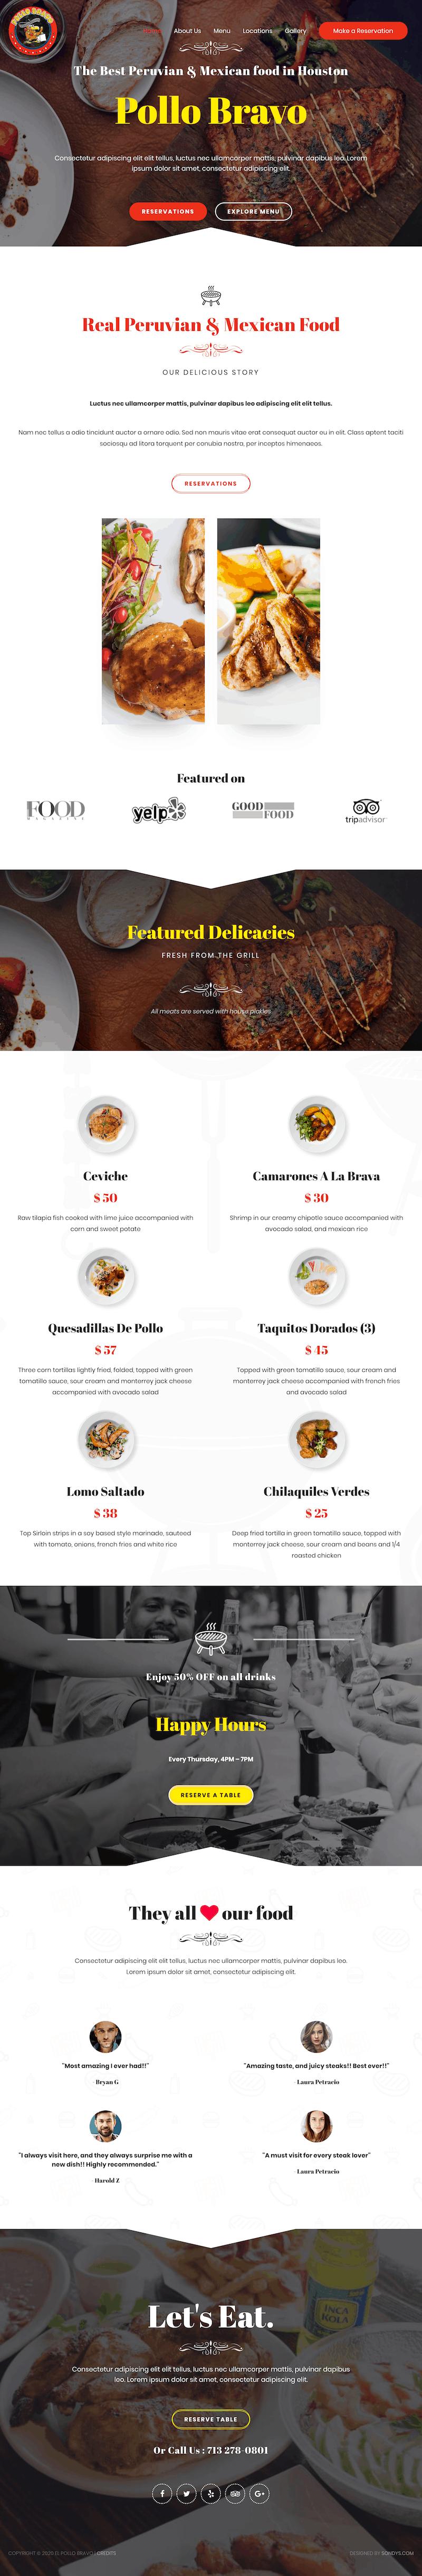 el pollo bravo restaurant web design development houston home page